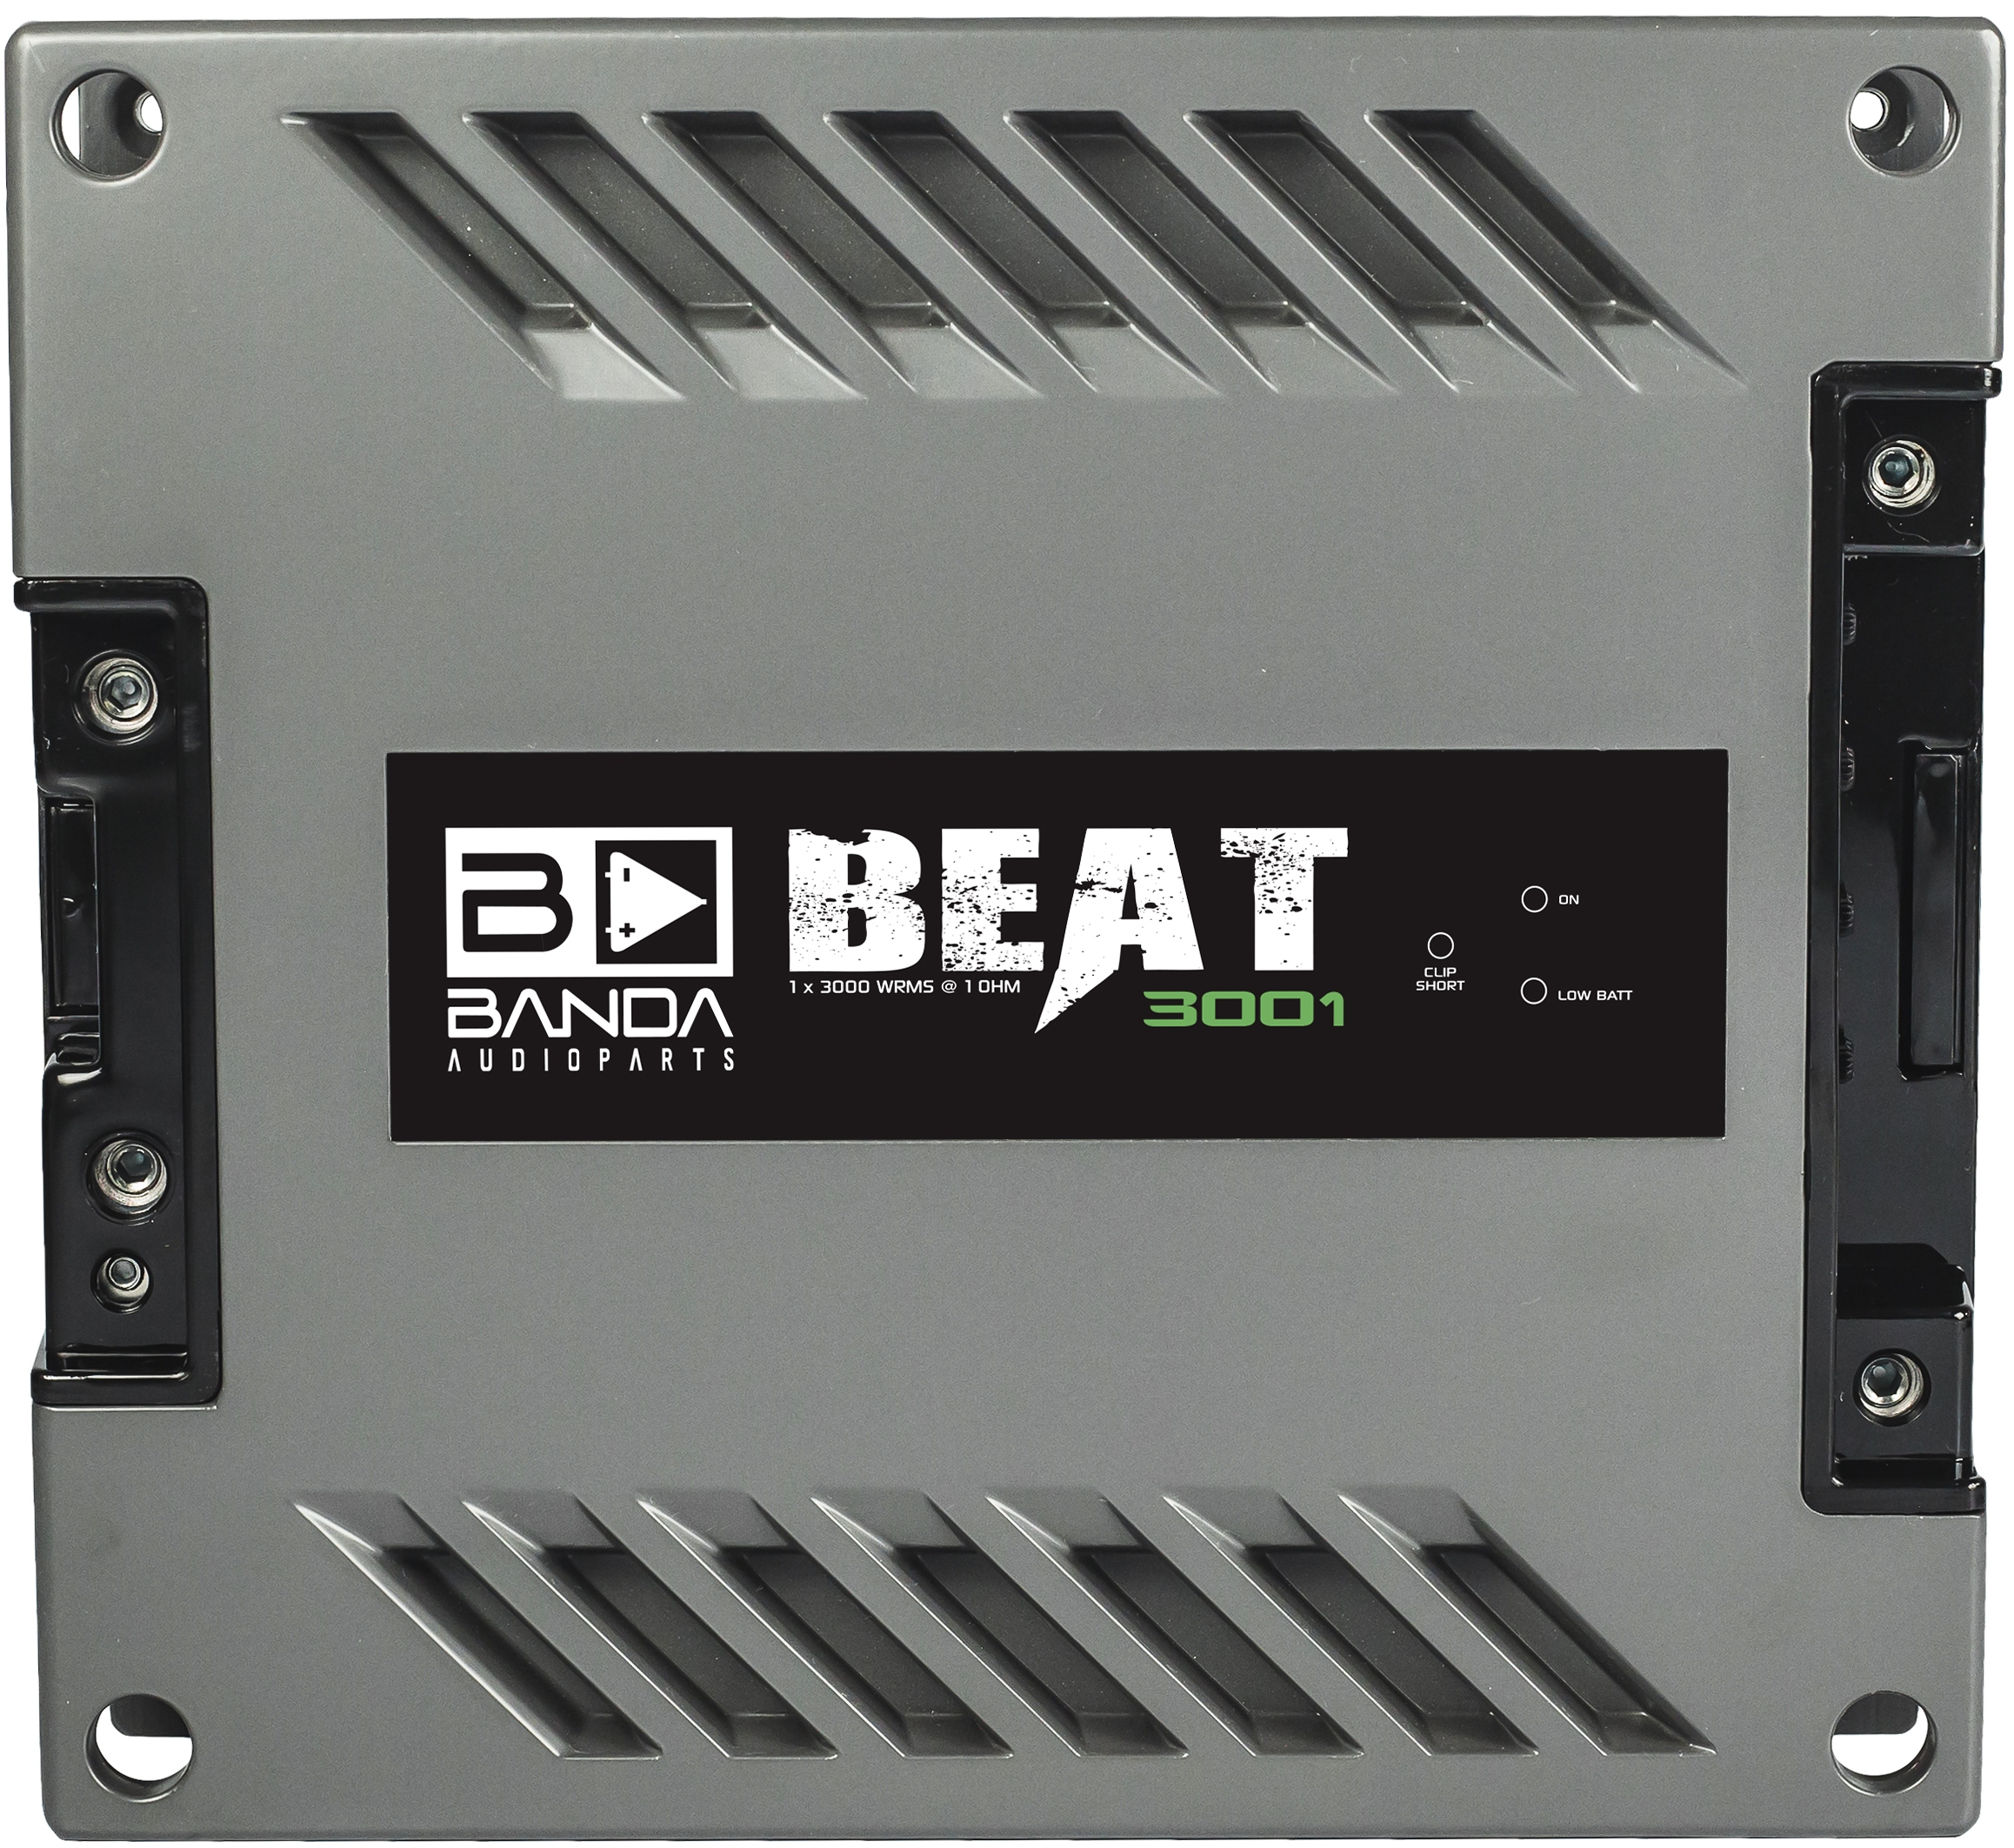 beat-3001-frente-19 BEAT 3001